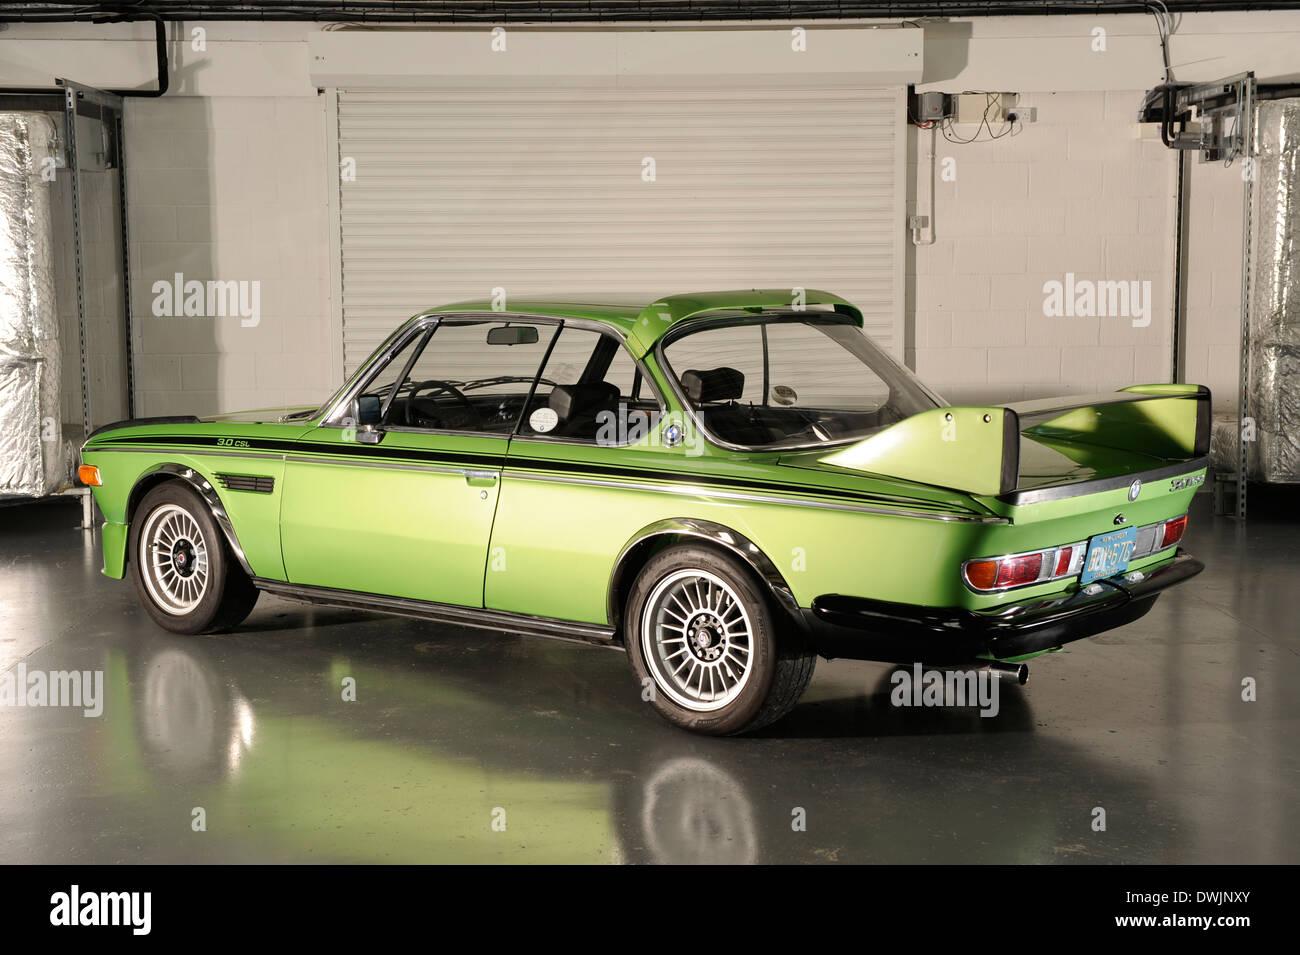 1975 Bmw 3 0 Csl Bat Batmobile Stock Photo 67409859 Alamy